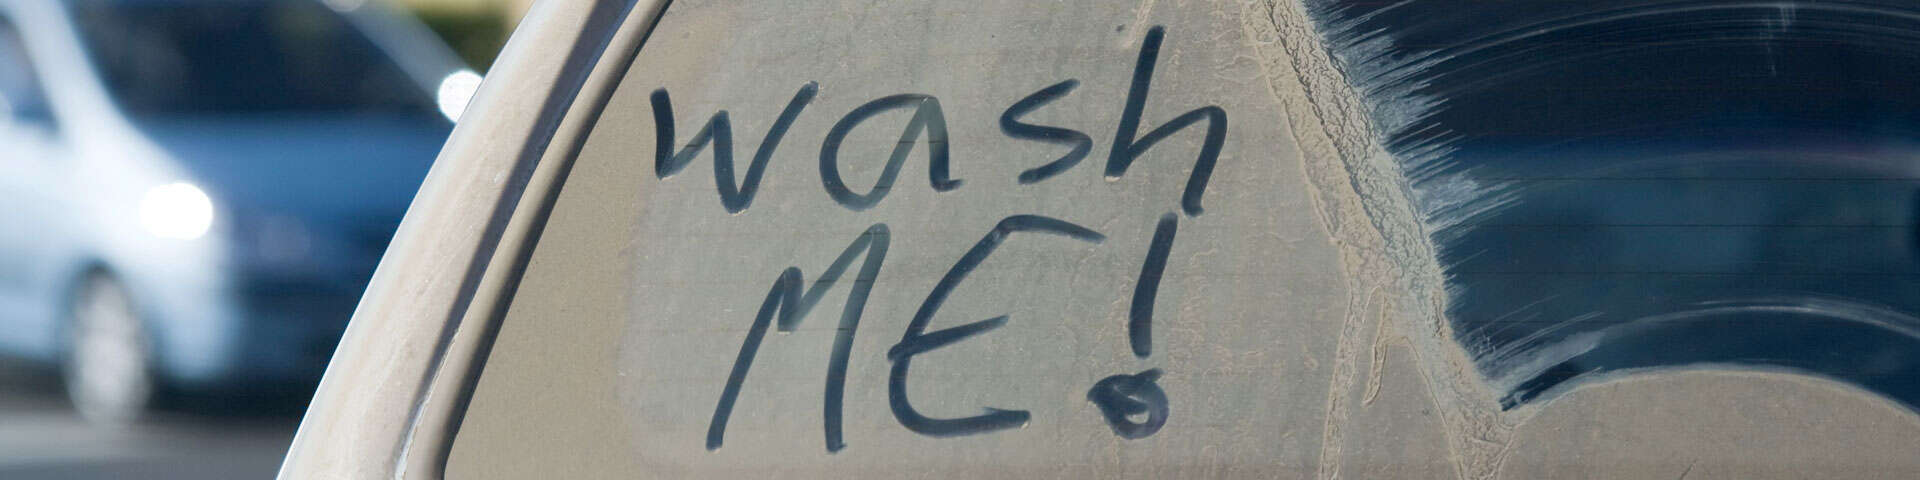 """Wash me"" phrase on a dirty car window"